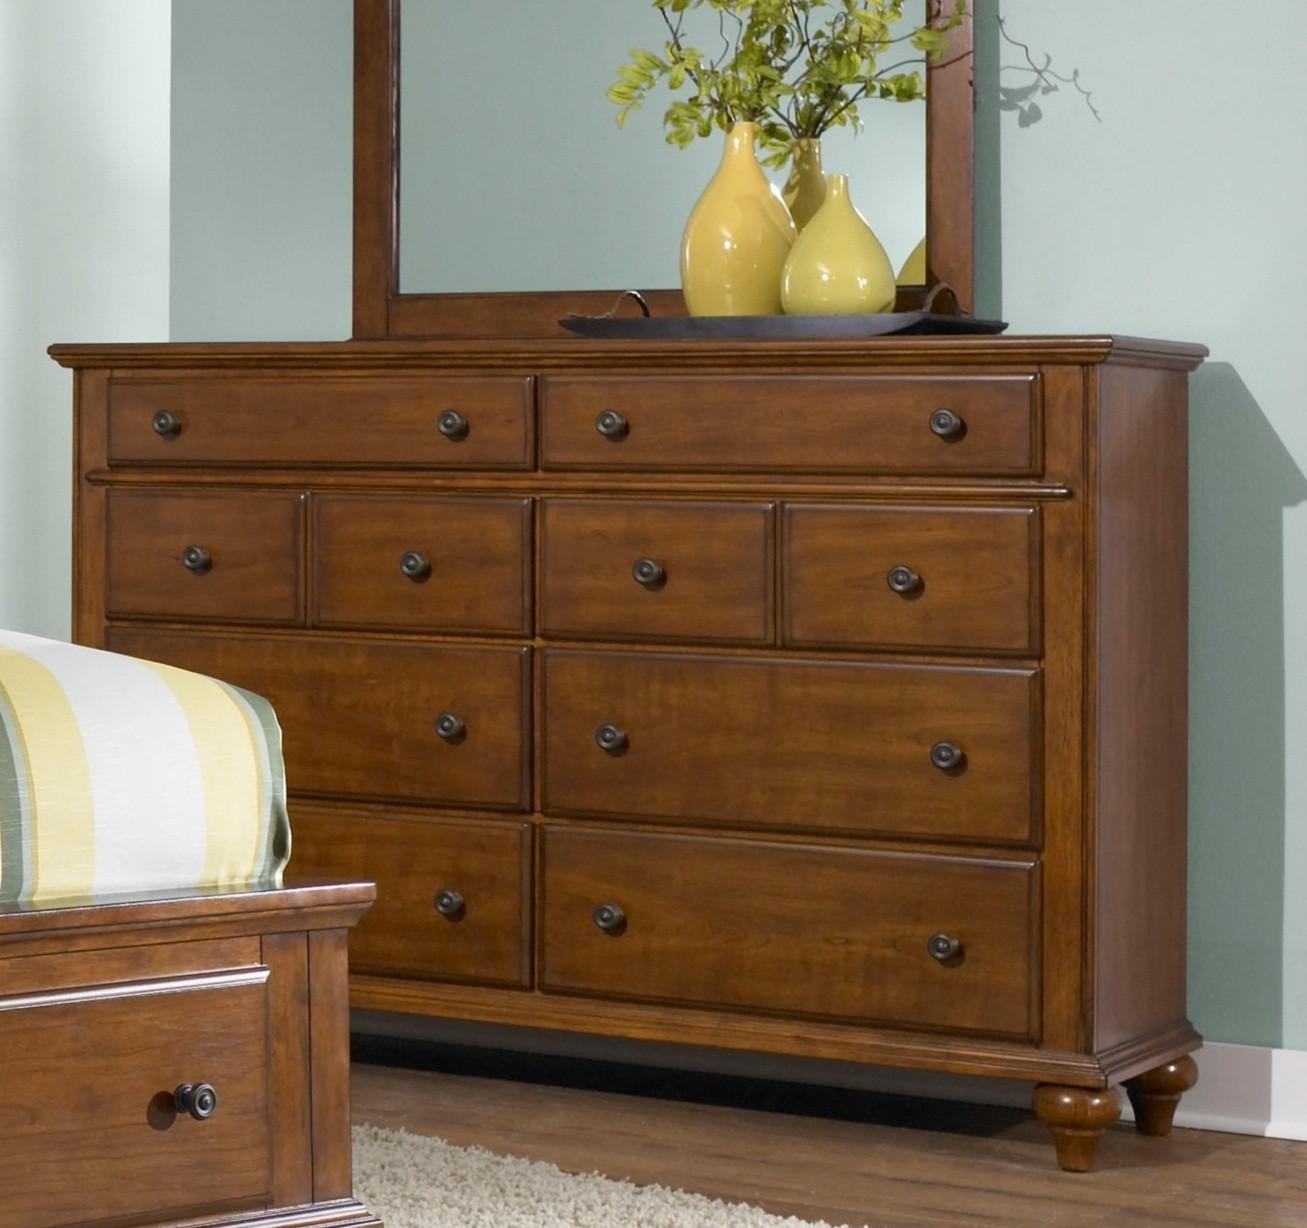 hayden place light cherry drawer dresser from broyhill 4648 230 coleman f. Black Bedroom Furniture Sets. Home Design Ideas